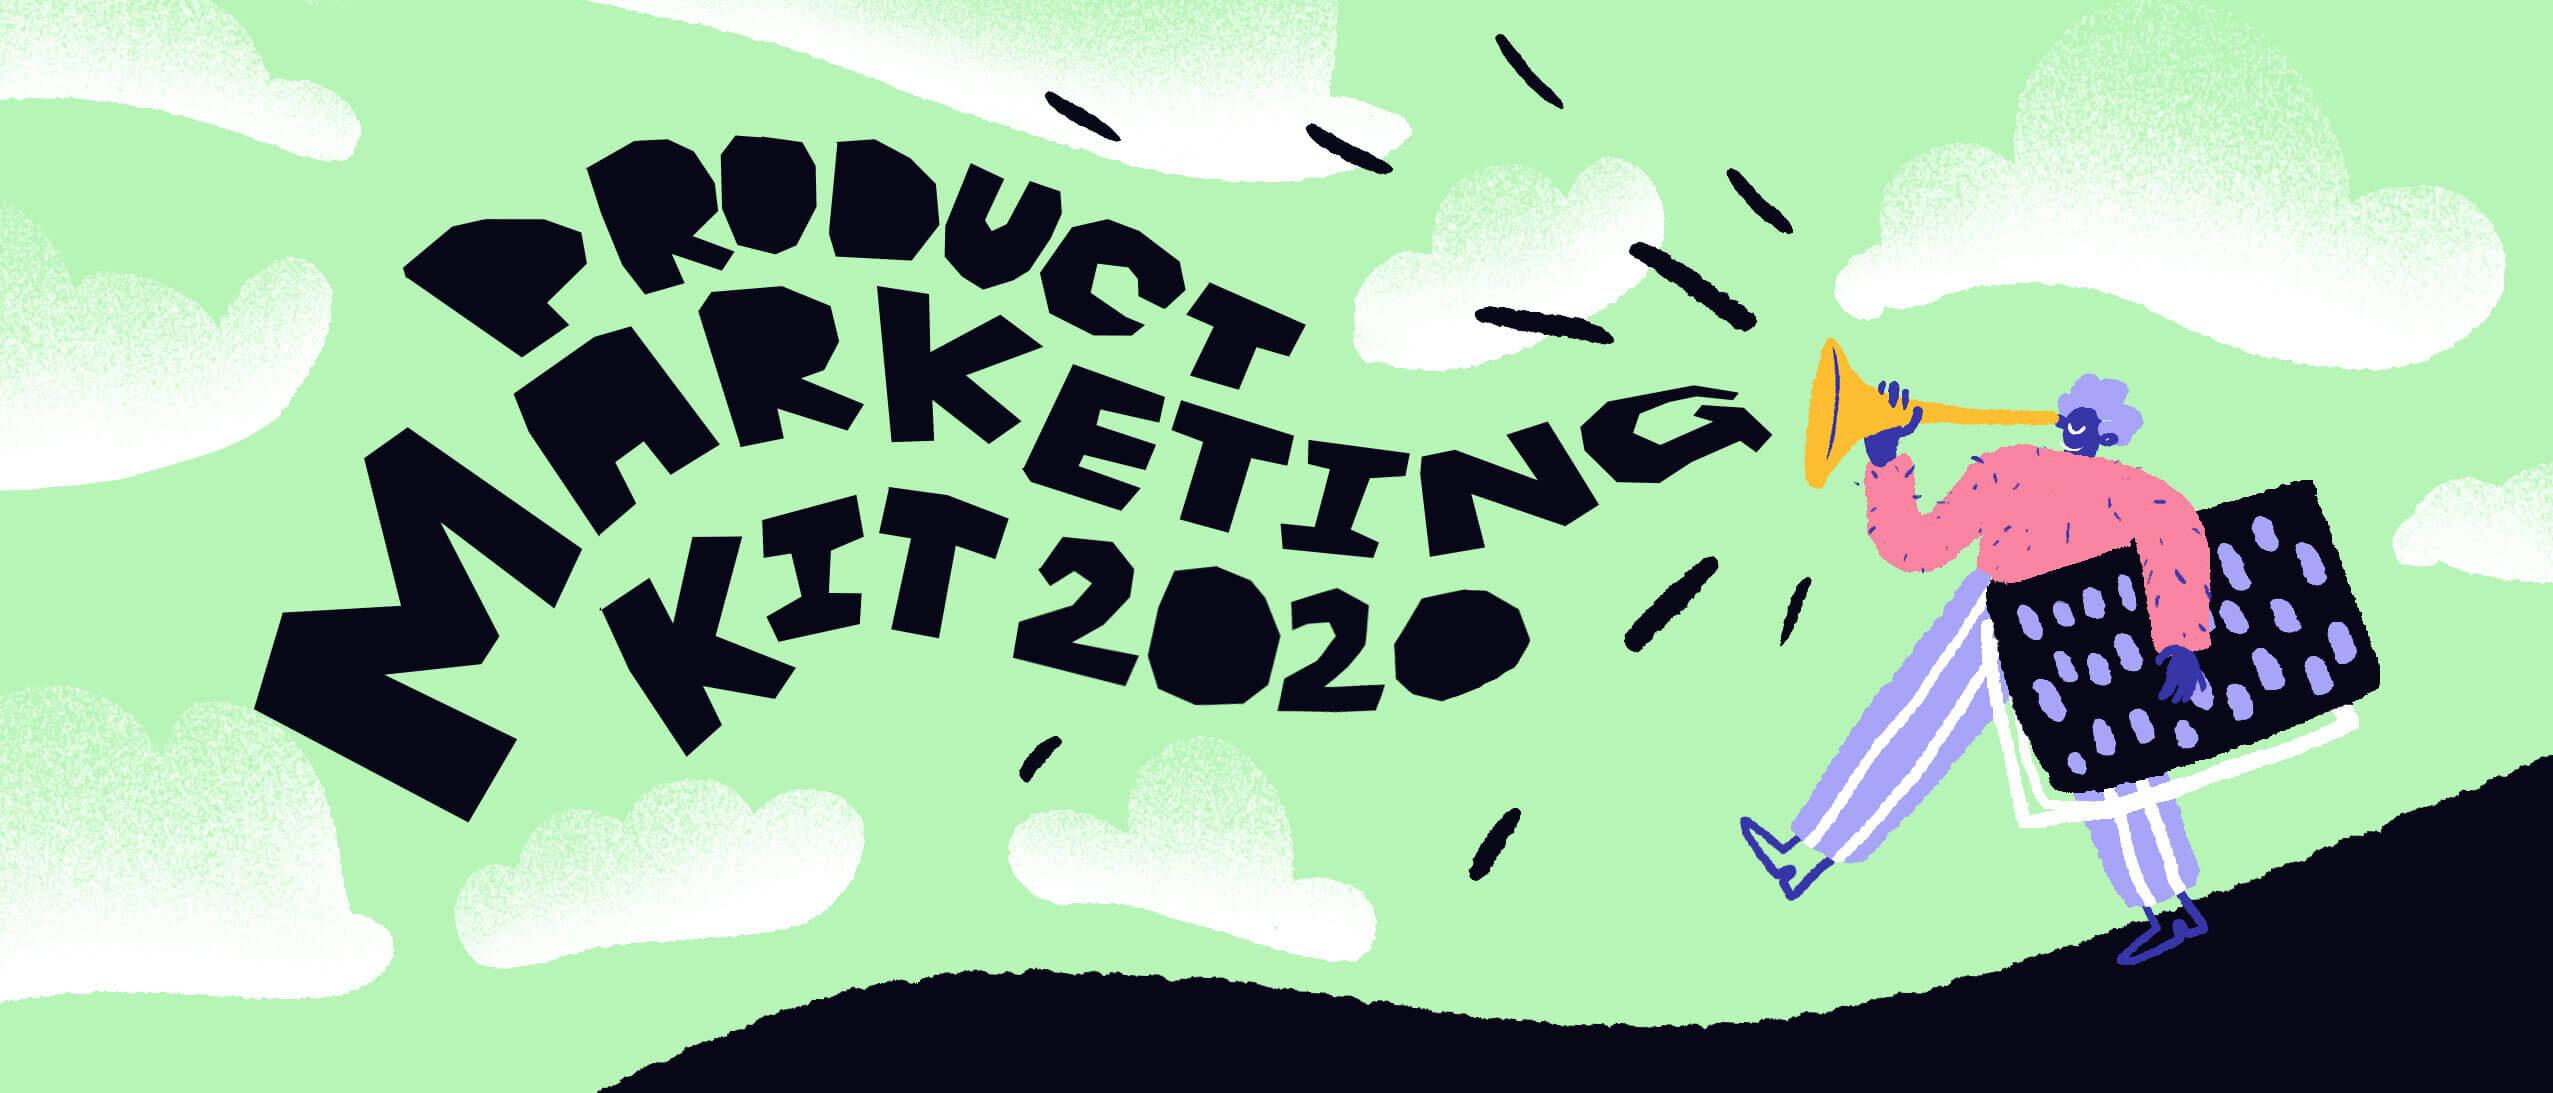 product marketing